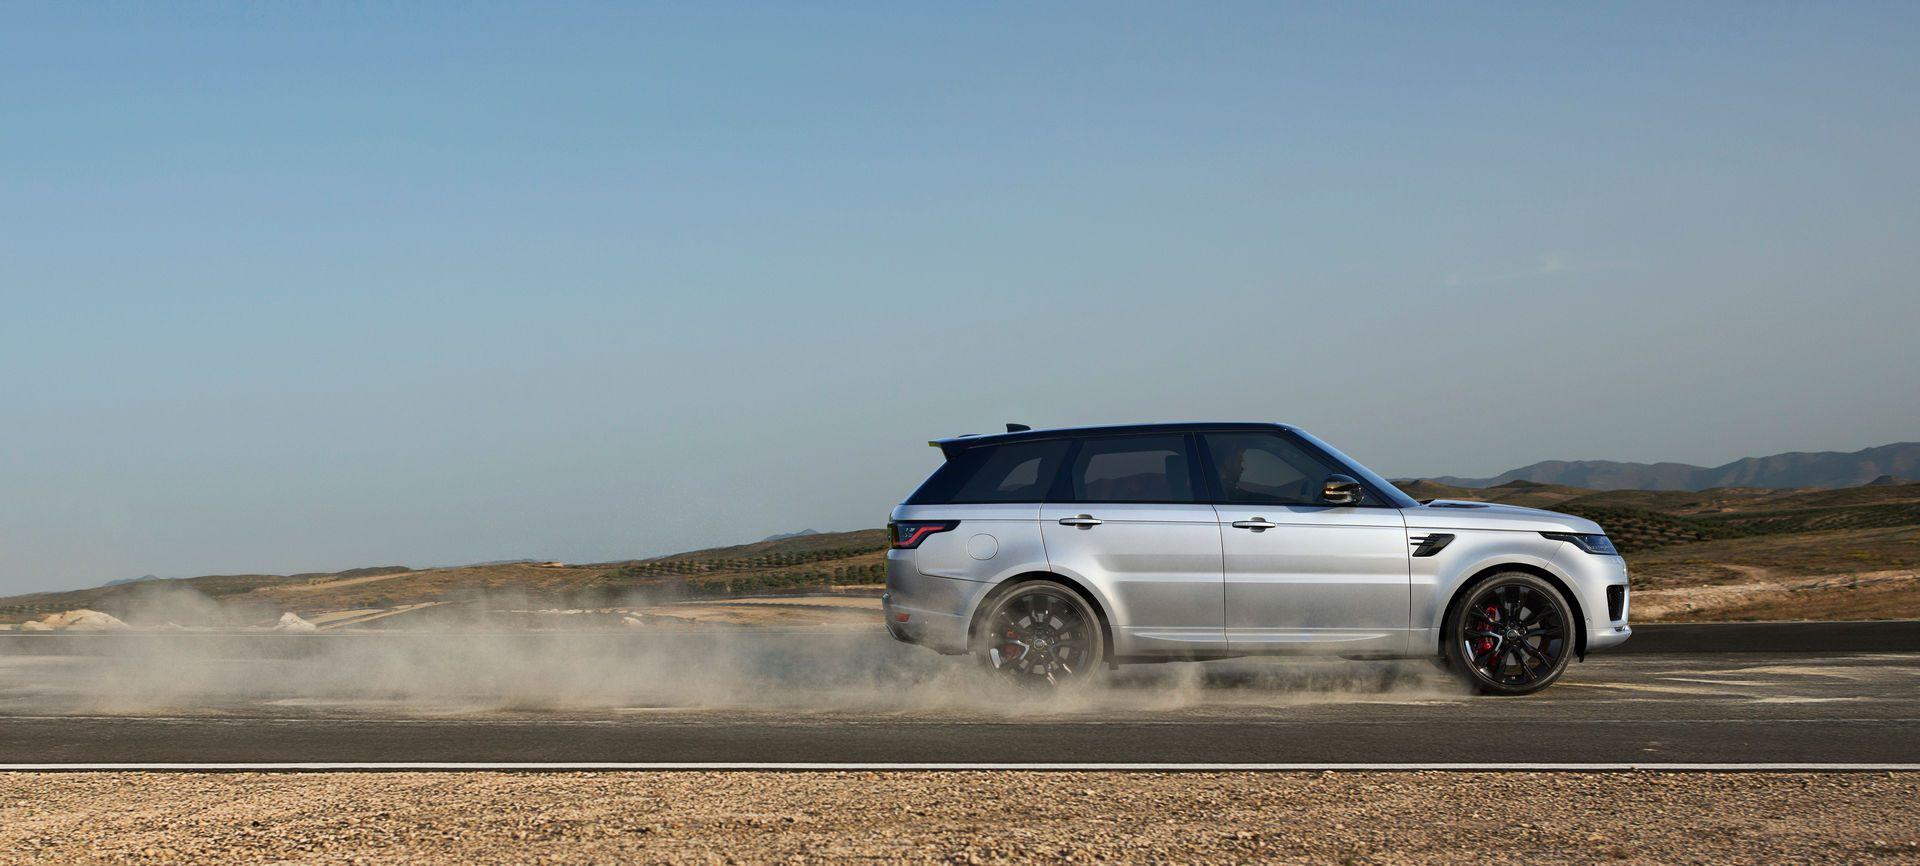 2021-Range-Rover-Sport-15